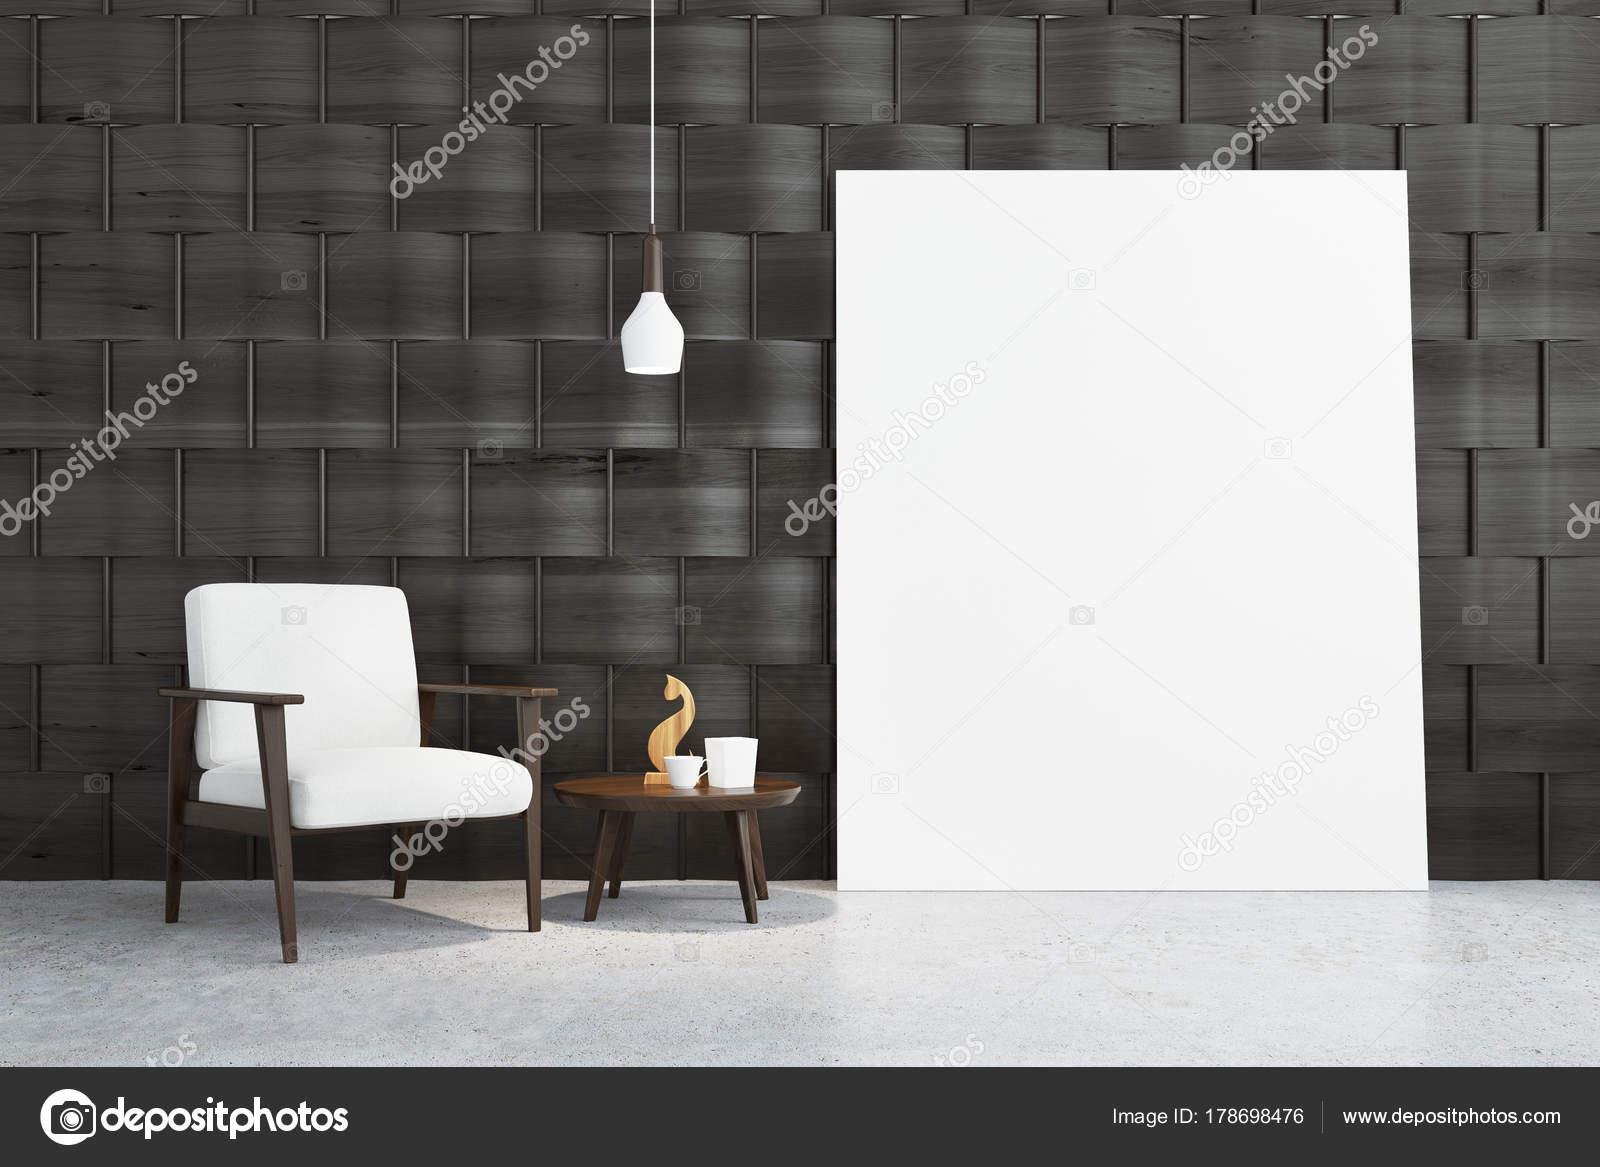 637e6aa1f8e Άδειο δωμάτιο γκρι εσωτερικό με ένα λευκό πολυθρόνα στέκεται σε ένα  τσιμεντένιο πάτωμα κοντά στο τραπεζάκι με ένα ειδώλιο ξύλινη γάτα. Μια αφίσα .